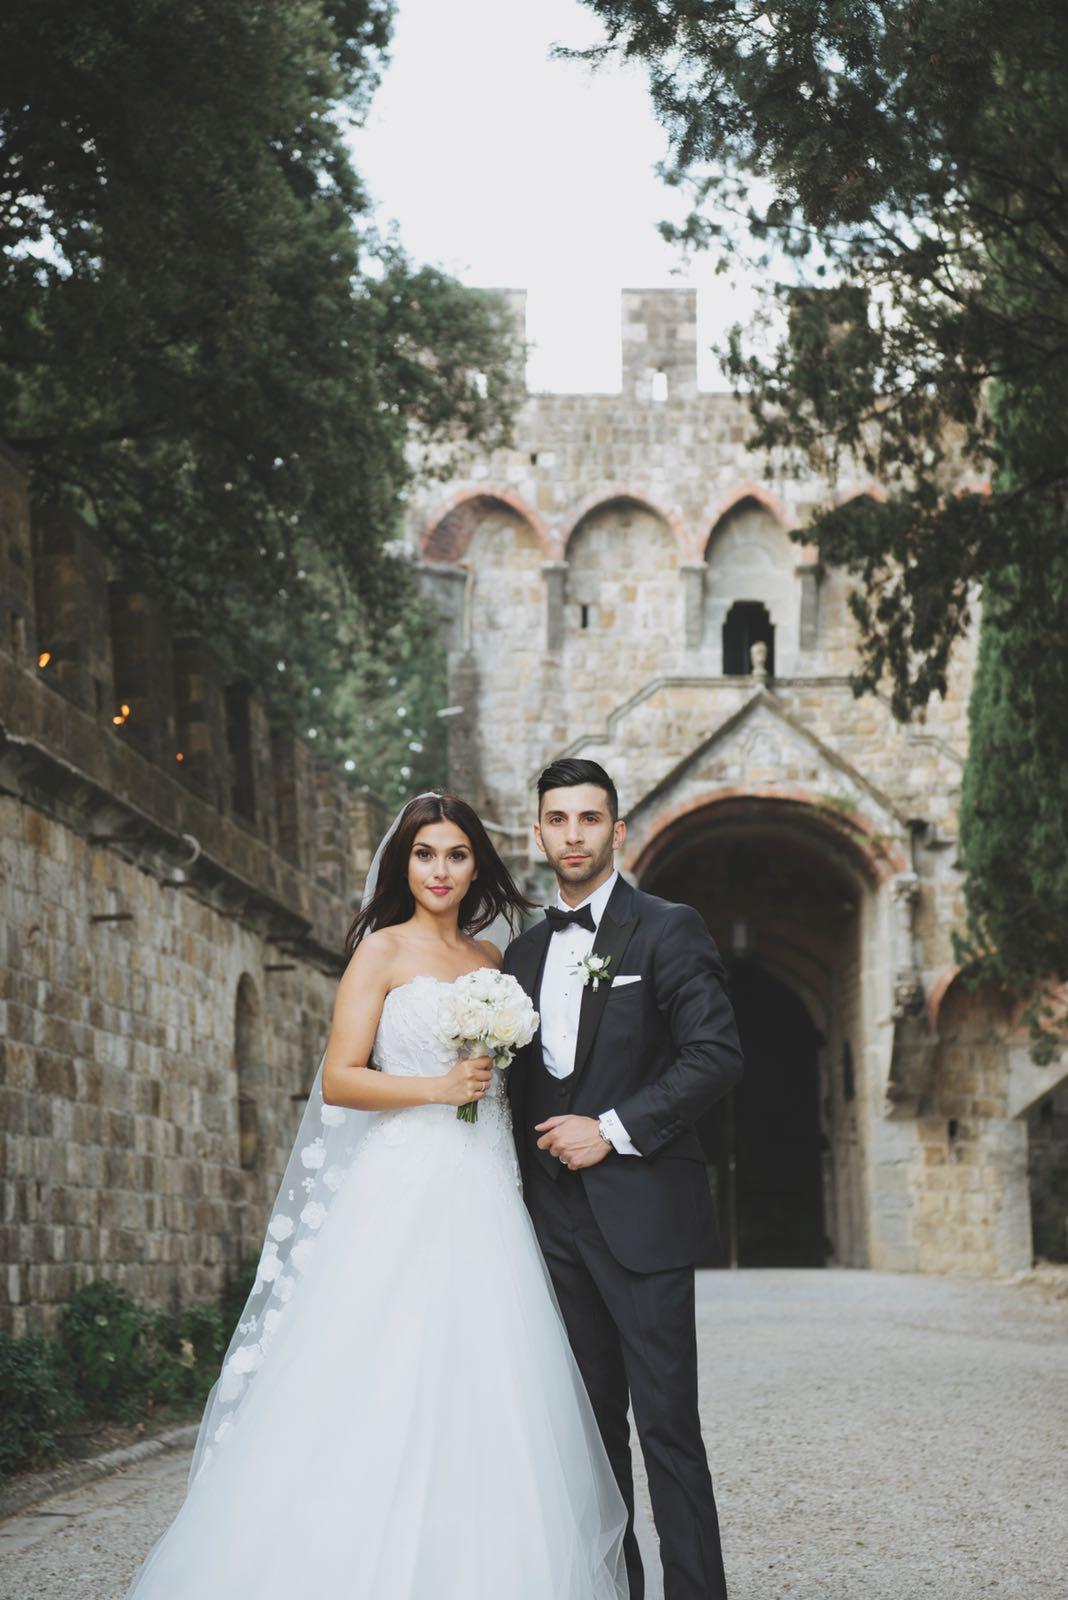 Italy Wedding couple - Gemma Sutton Pro Team